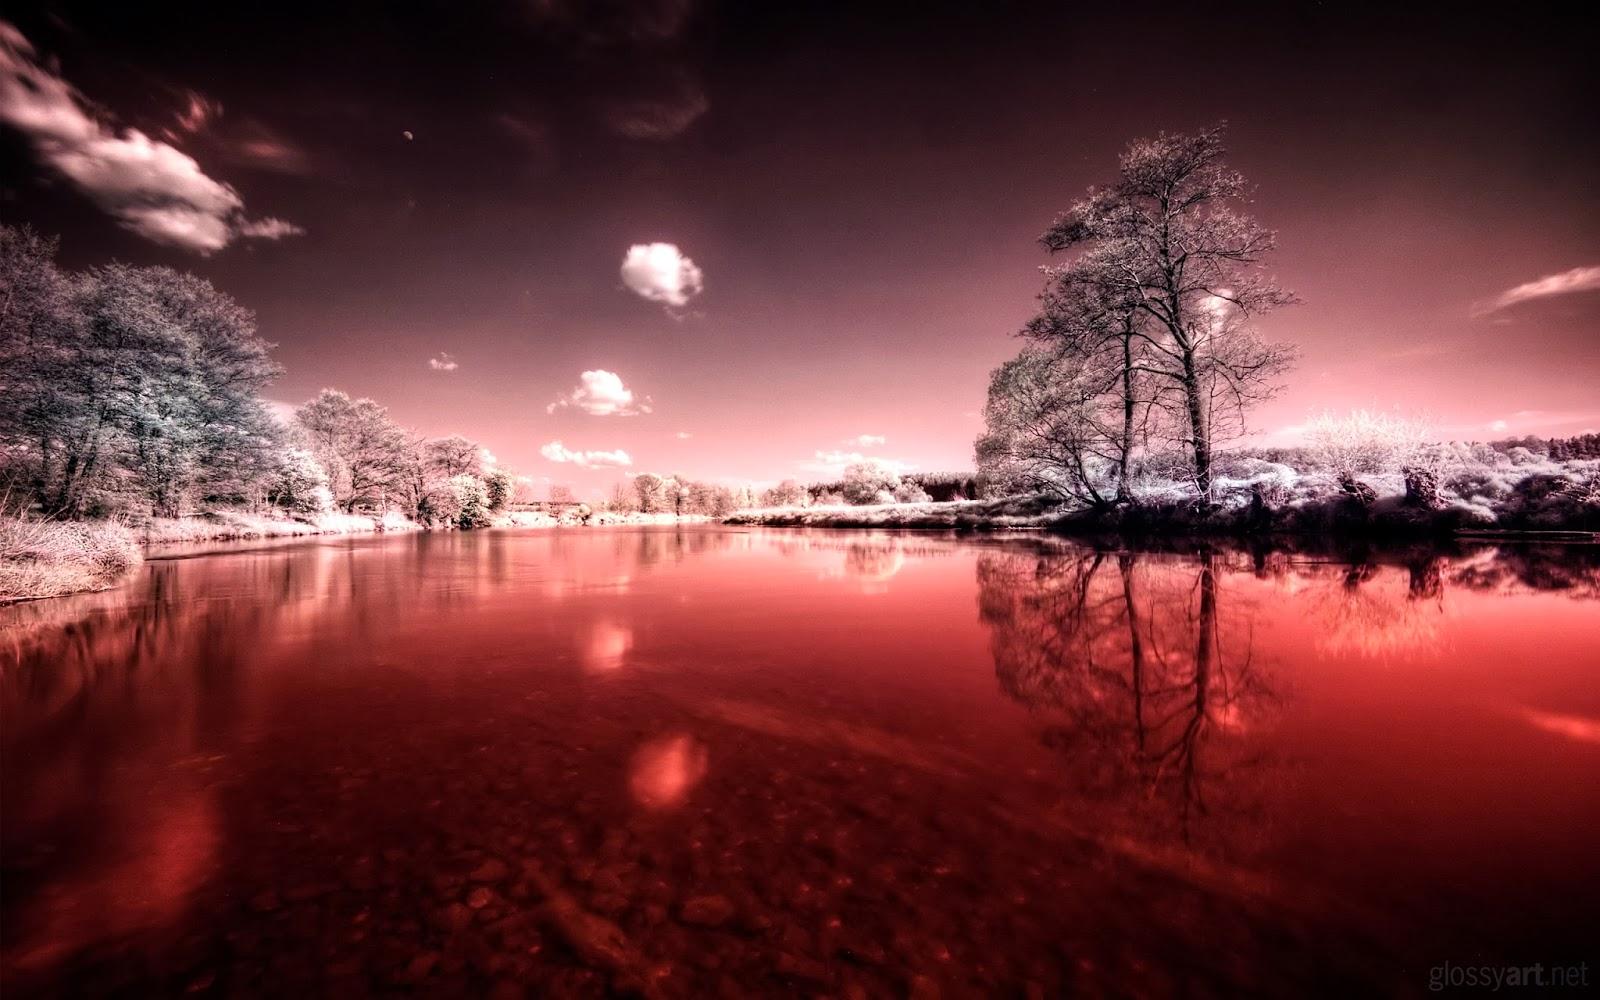 "<img src=""http://2.bp.blogspot.com/-HPDGF-otuqc/UuAV6q5rdKI/AAAAAAAAJwU/1C94QCgk_2s/s1600/bloody-river.jpg"" alt=""bloody river"" />"